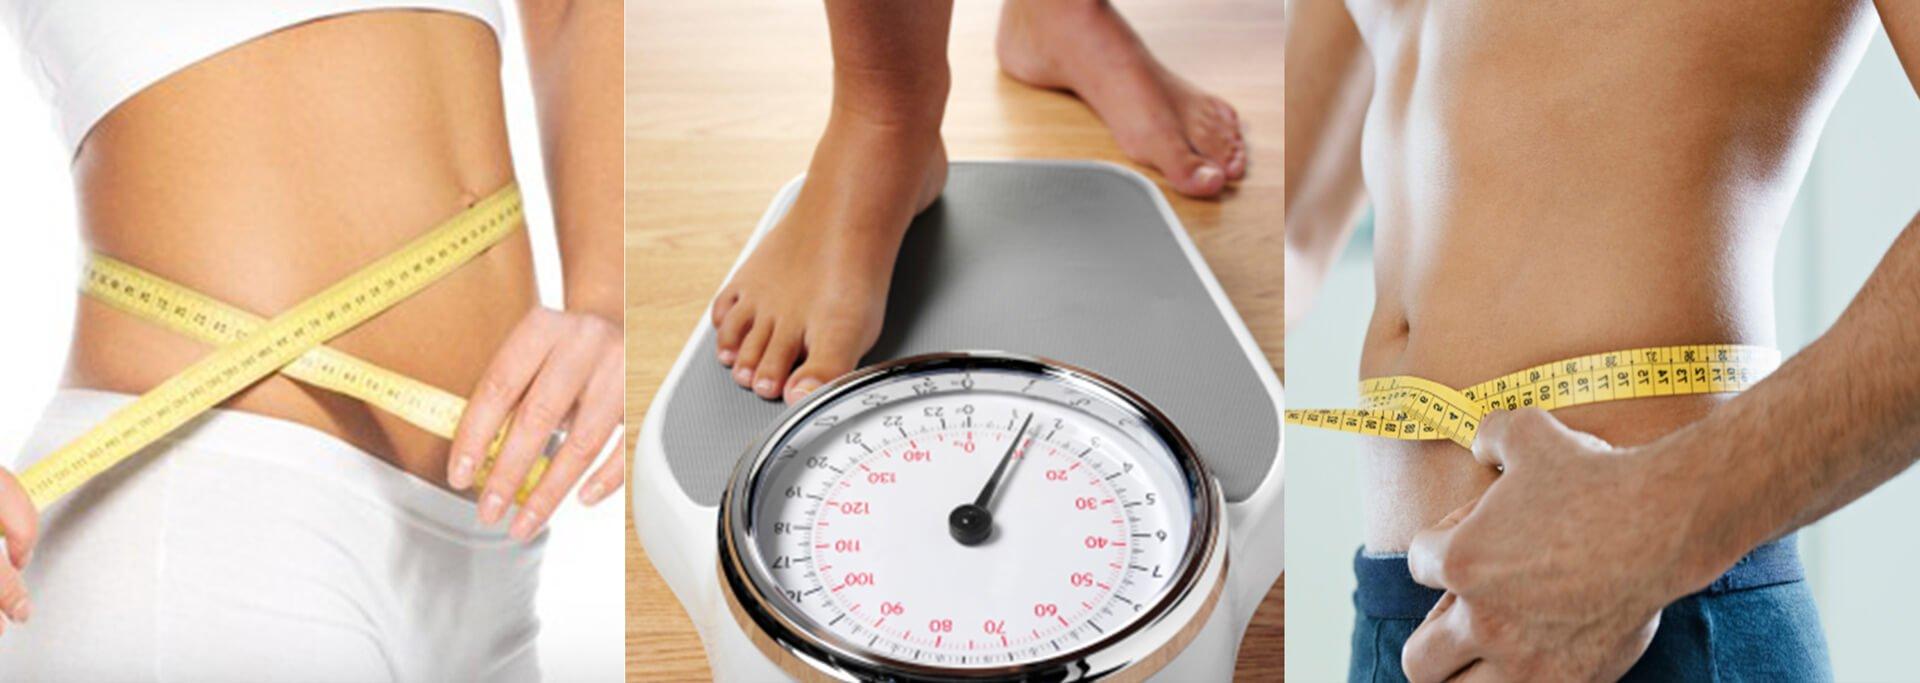 weight-loss (1)